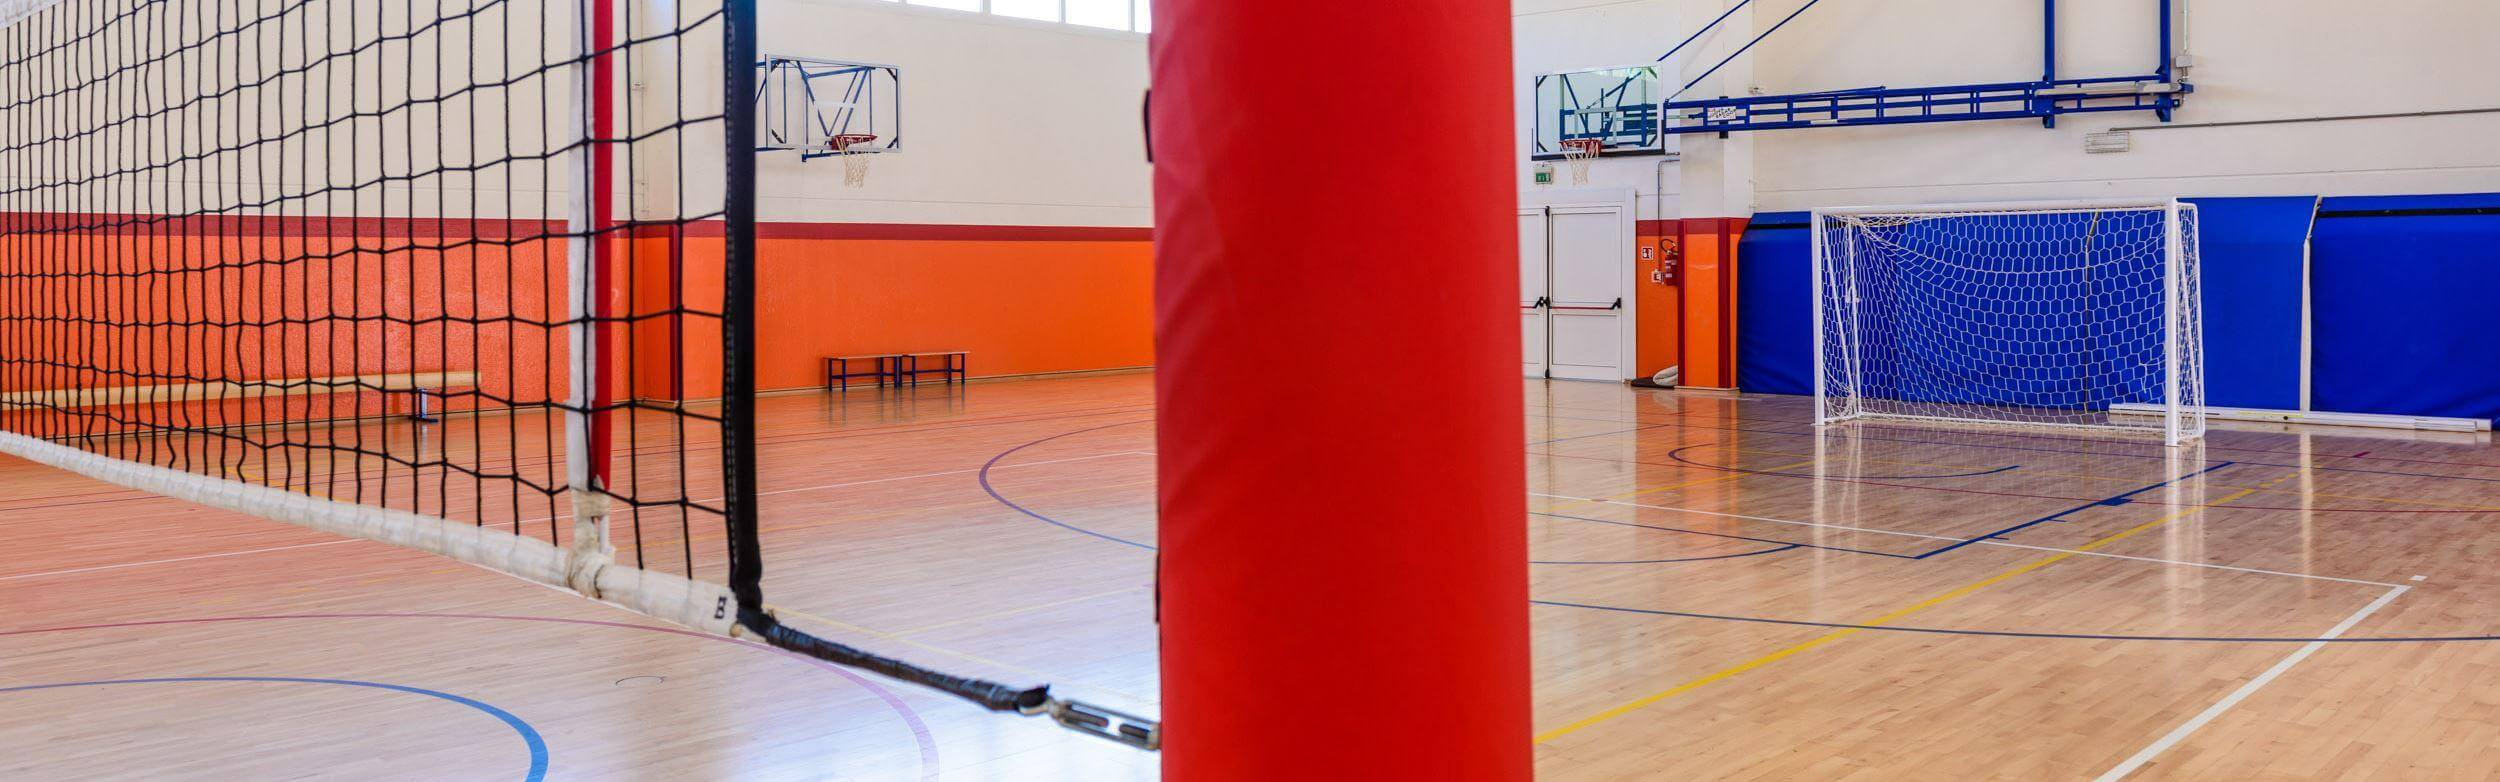 ALPIN športna oprema 2